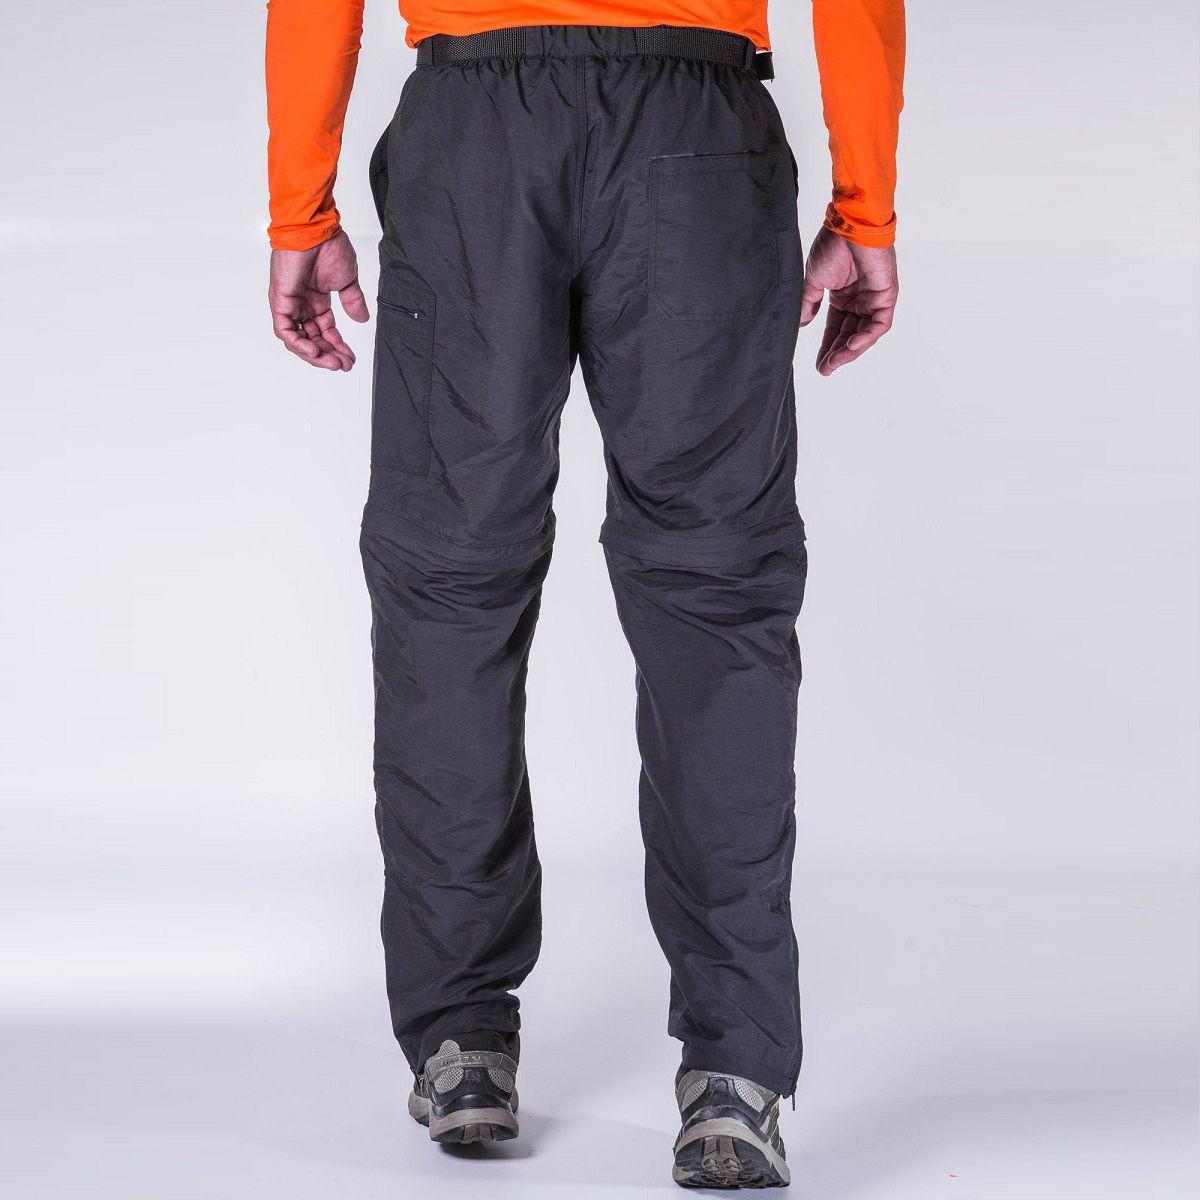 Calça-Bermuda Masculina Hard Bio Trekking UV50+ - Preta